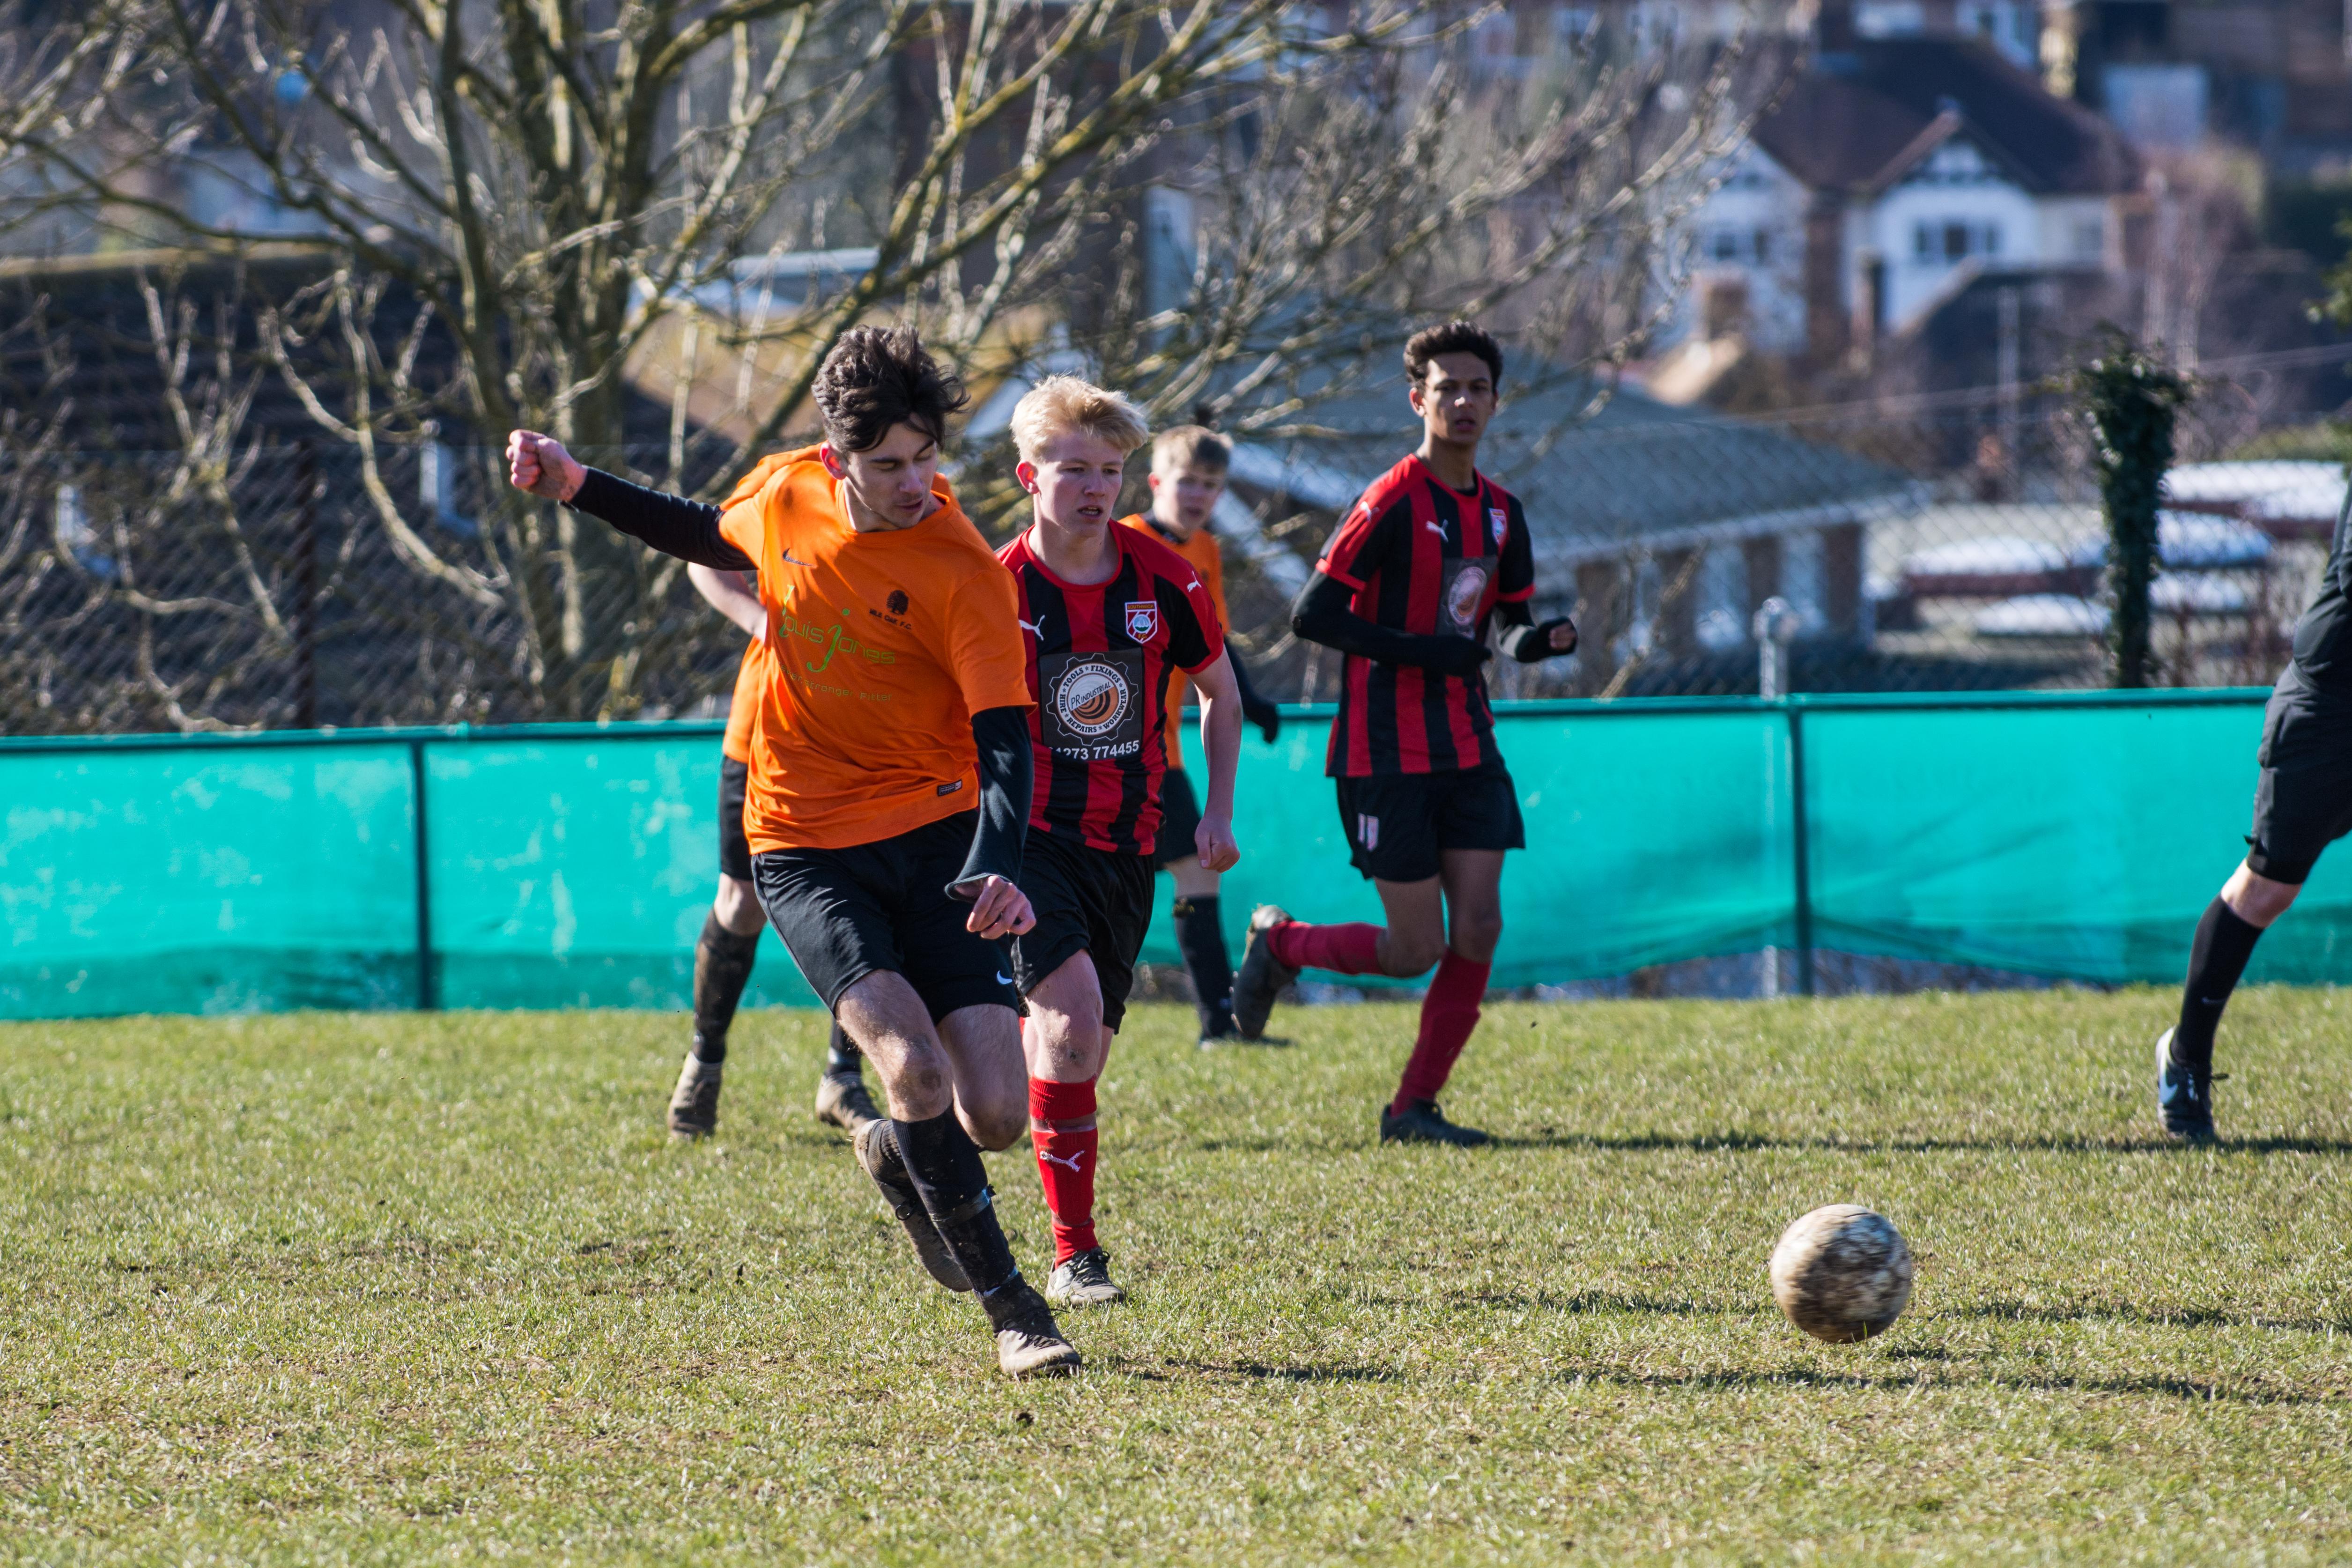 Mile Oak FC U18s vs Southwick FC U18s 25.02.18 24 DAVID_JEFFERY